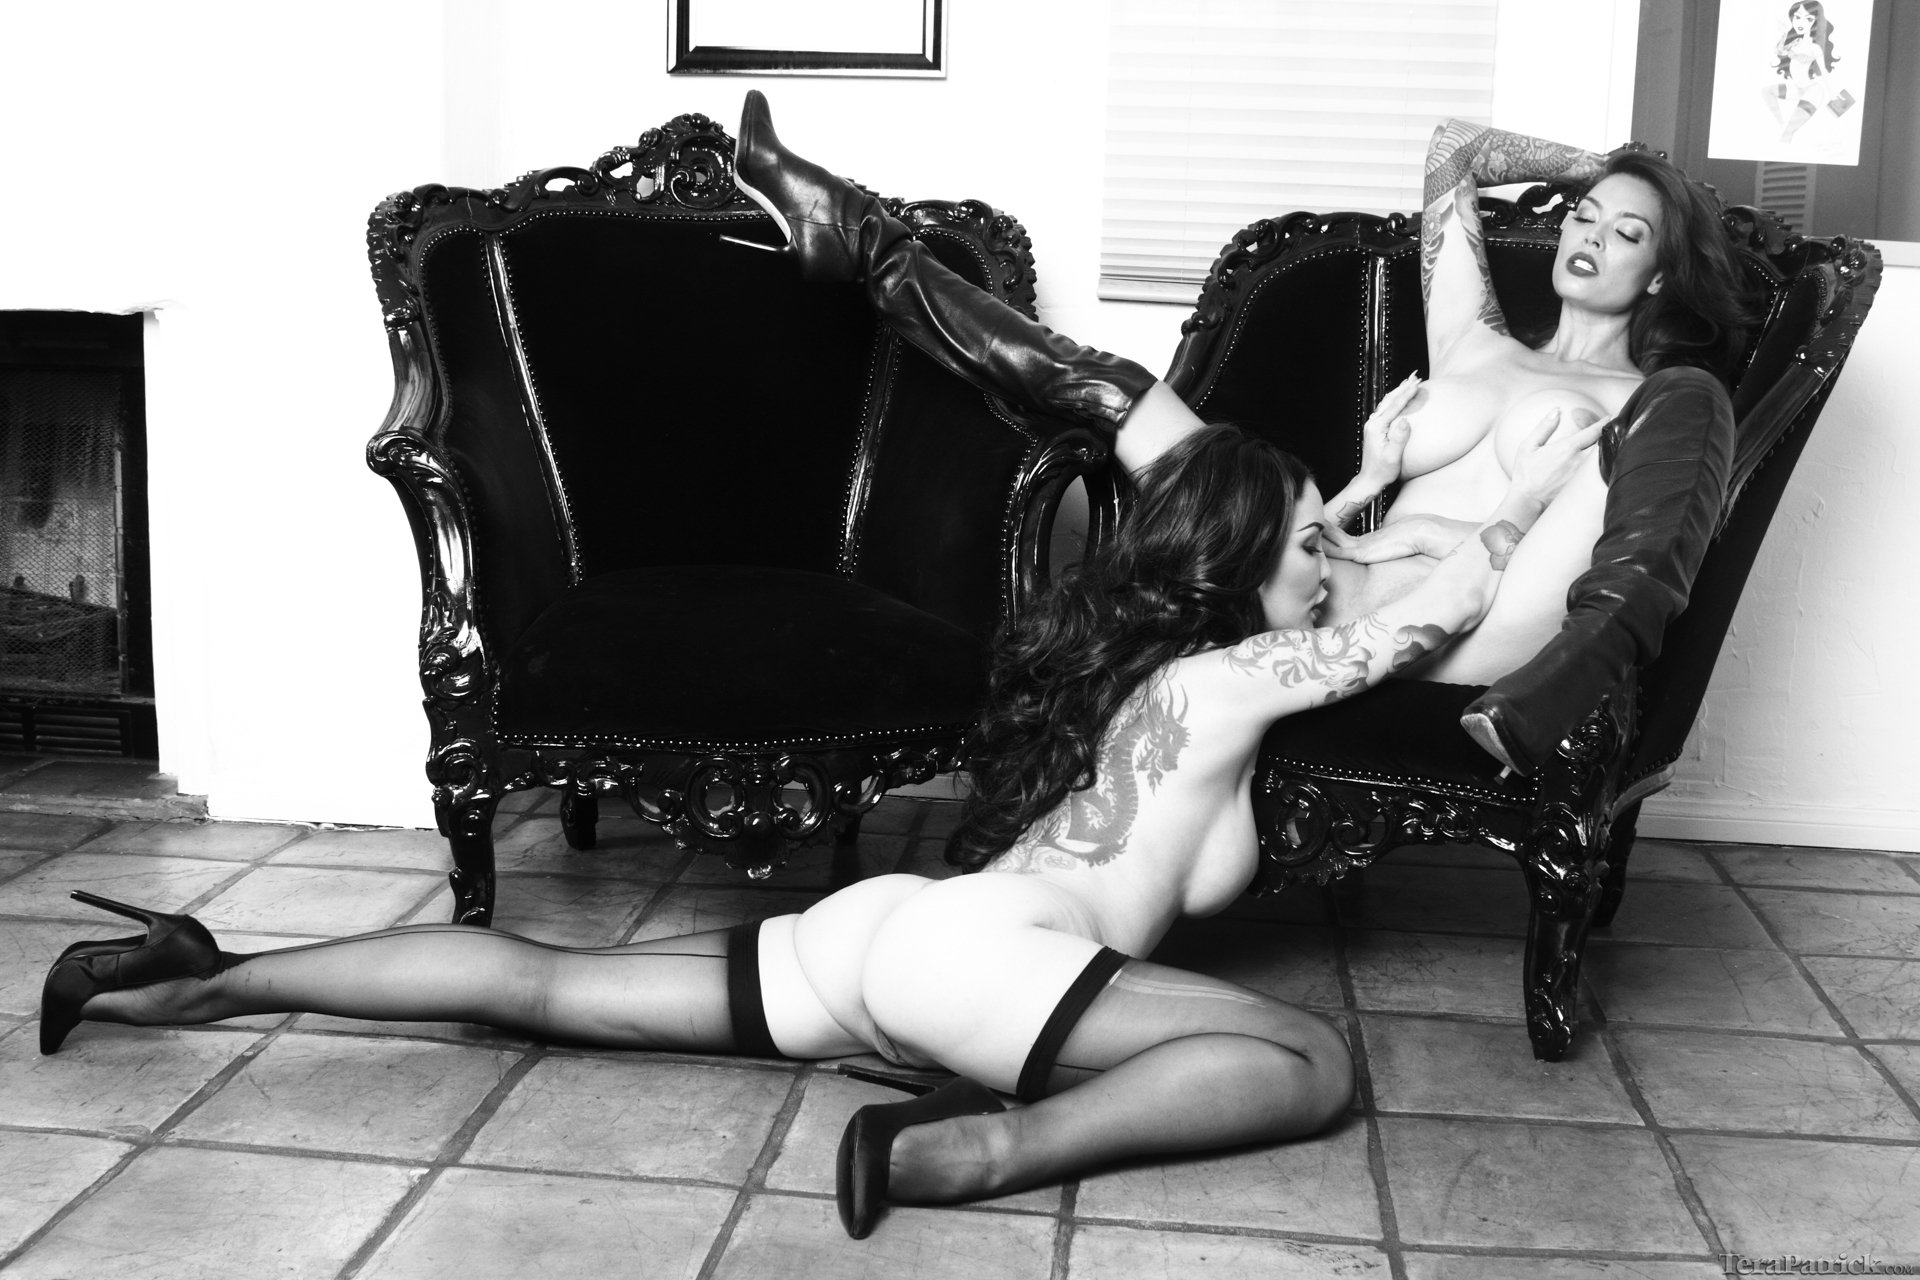 Лесбиянки черно белое фото — photo 10